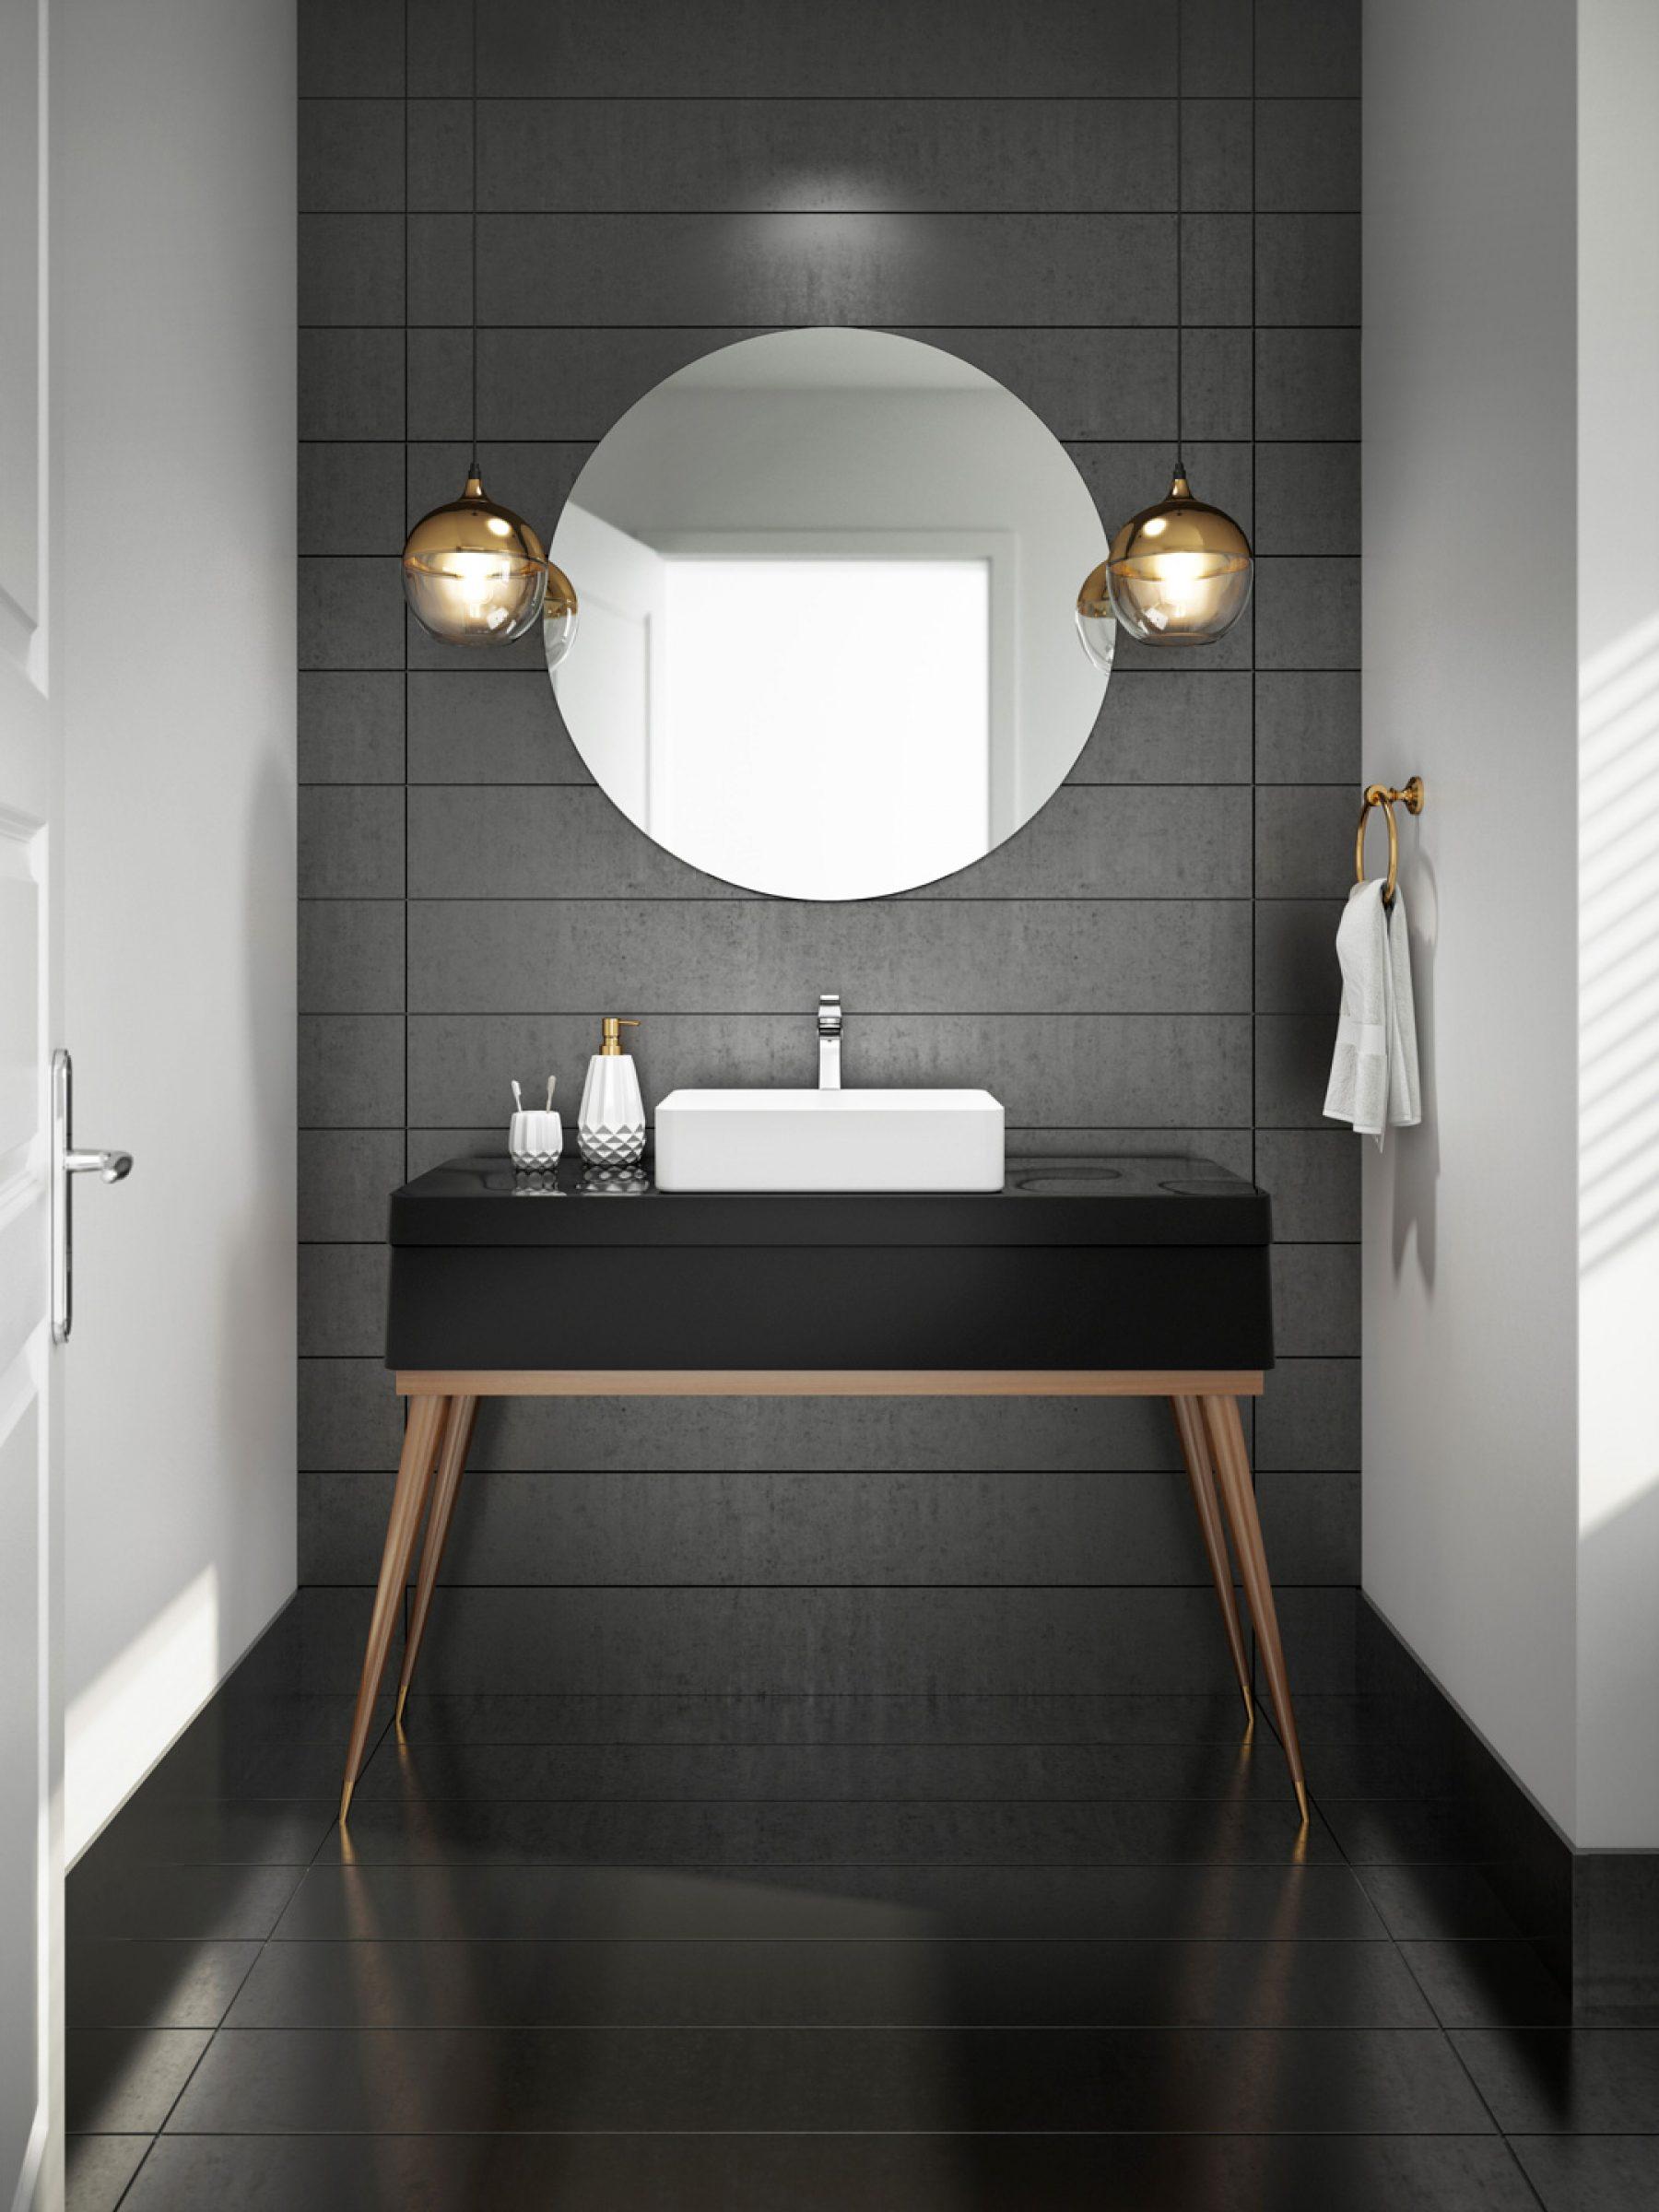 3d-bath-plan-minimalist-bathroom-furniture